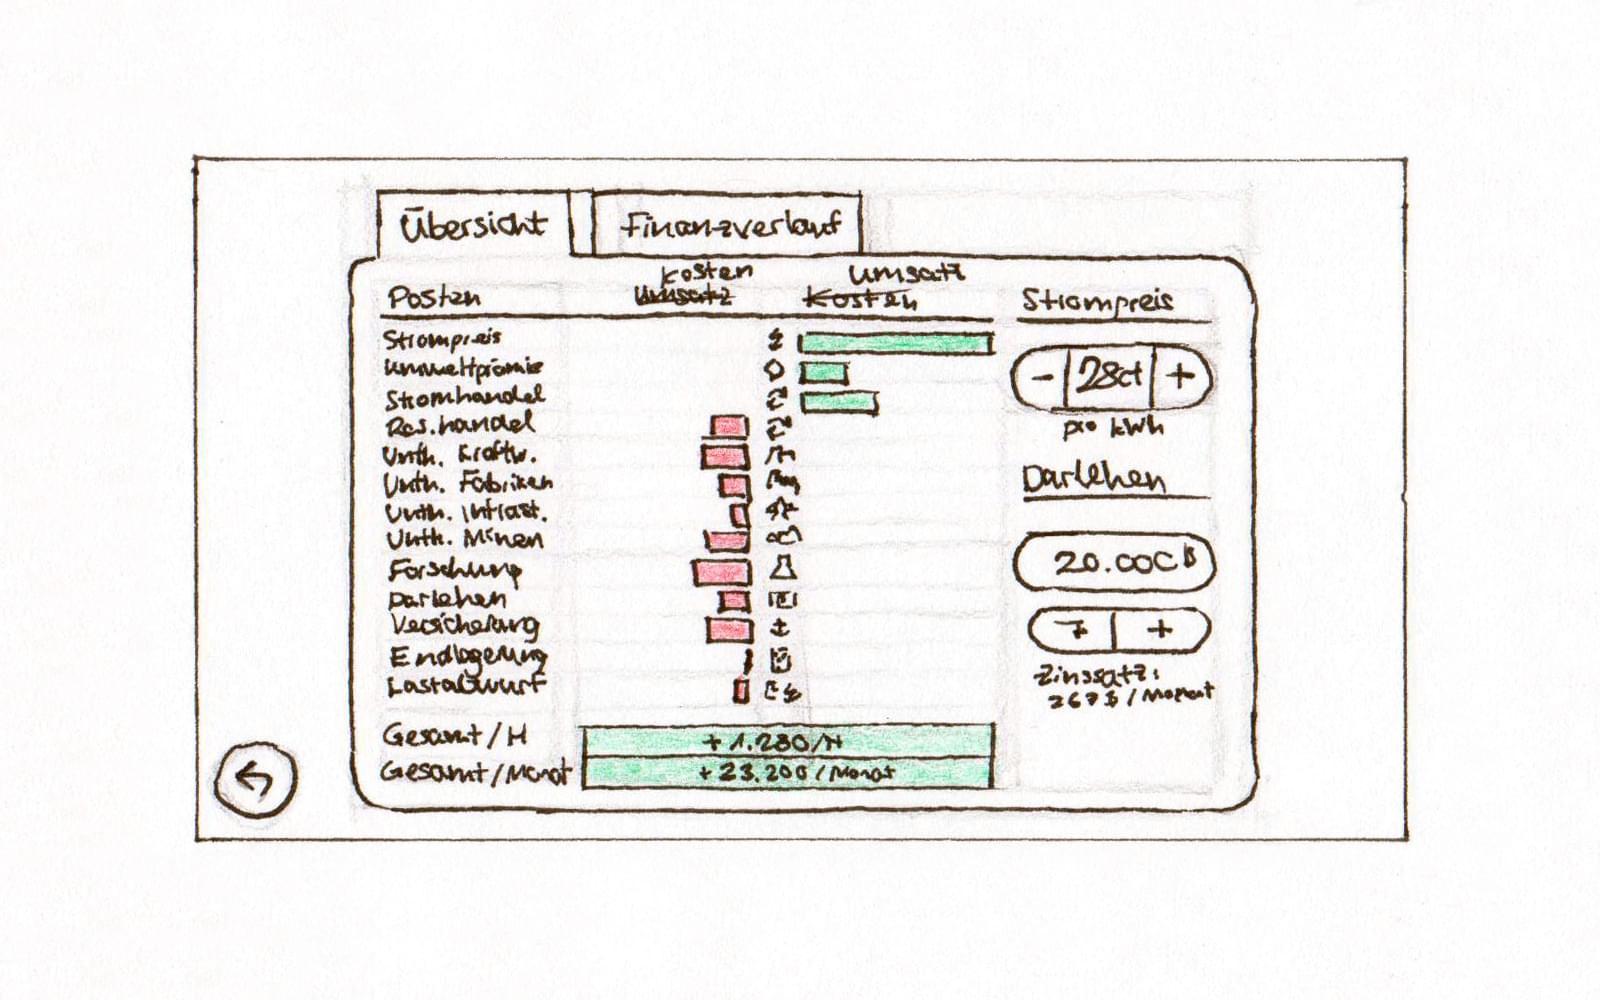 Wireframe sketch for mobile - Asset list of finances